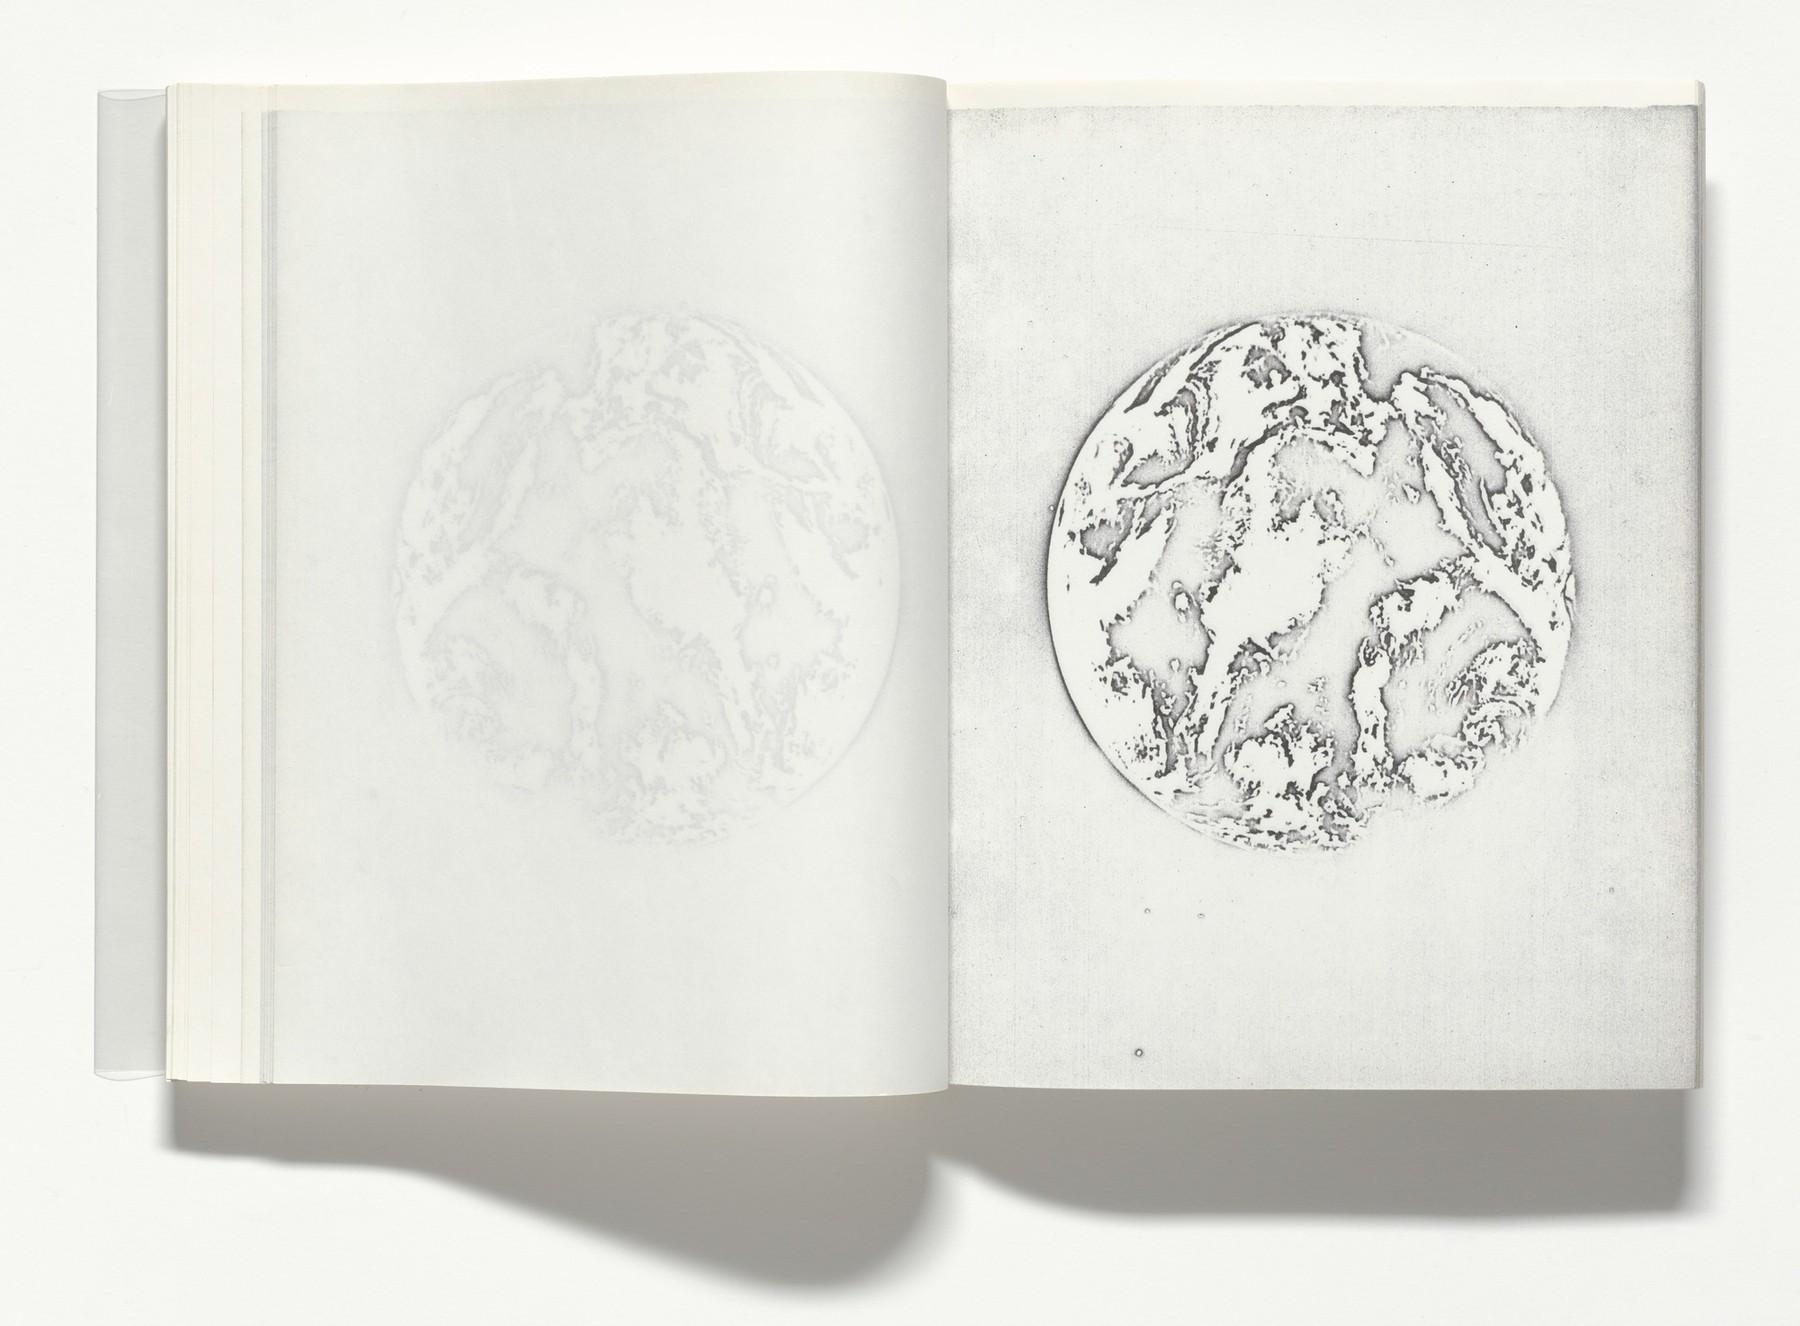 Robert Morris 25 plates from Untitled (Xerox Book) 1968